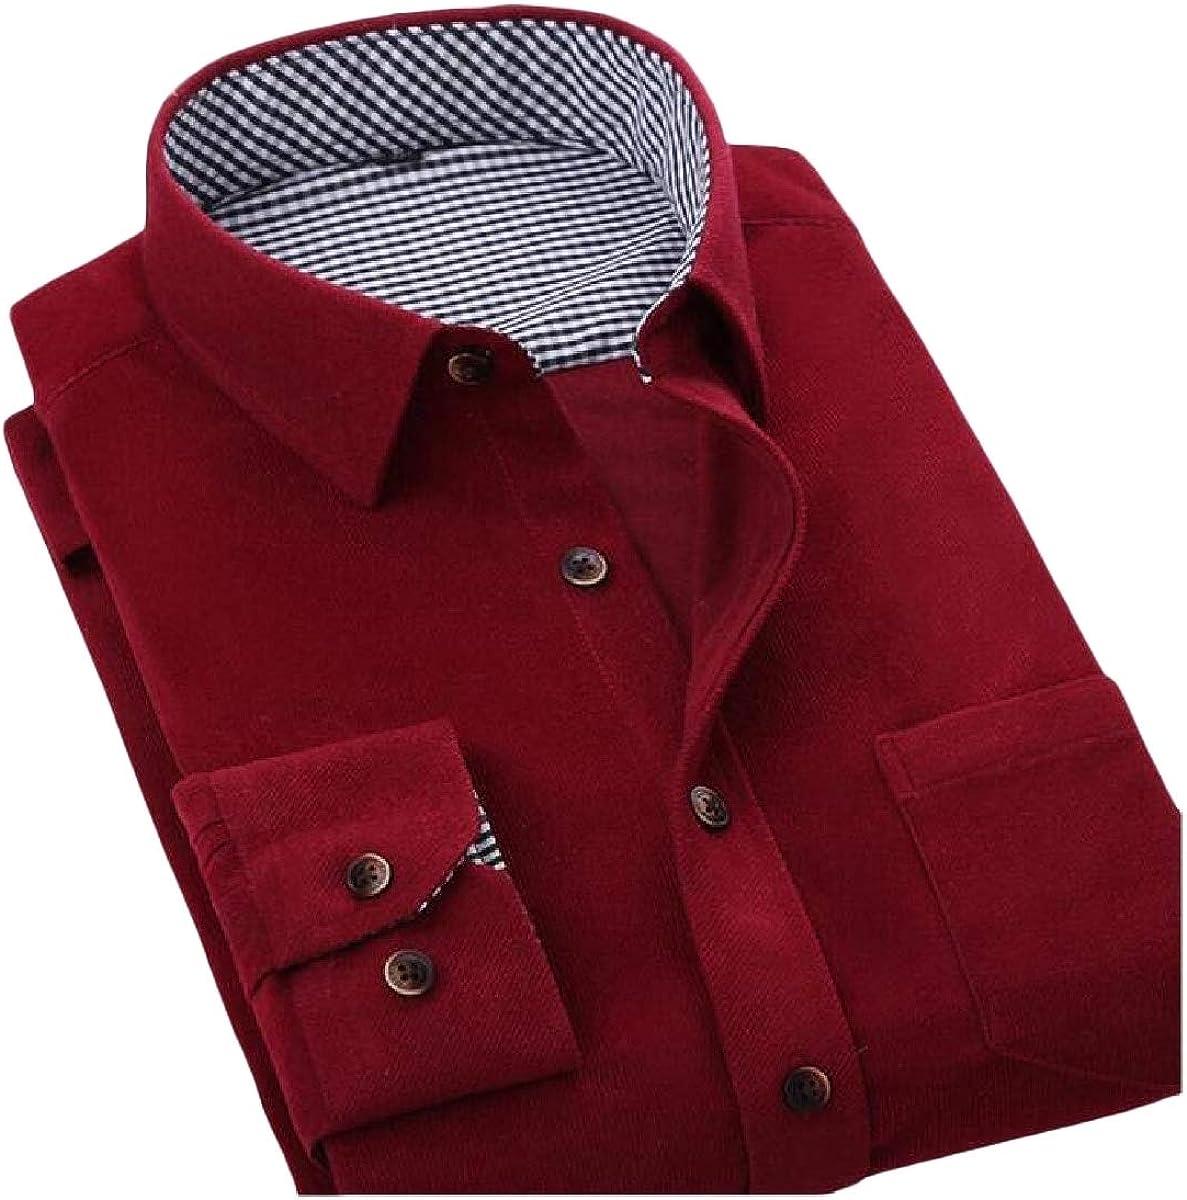 Lutratocro Men Button-Down Vogue Solid Corduroy Slim Long-Sleeve Shirt